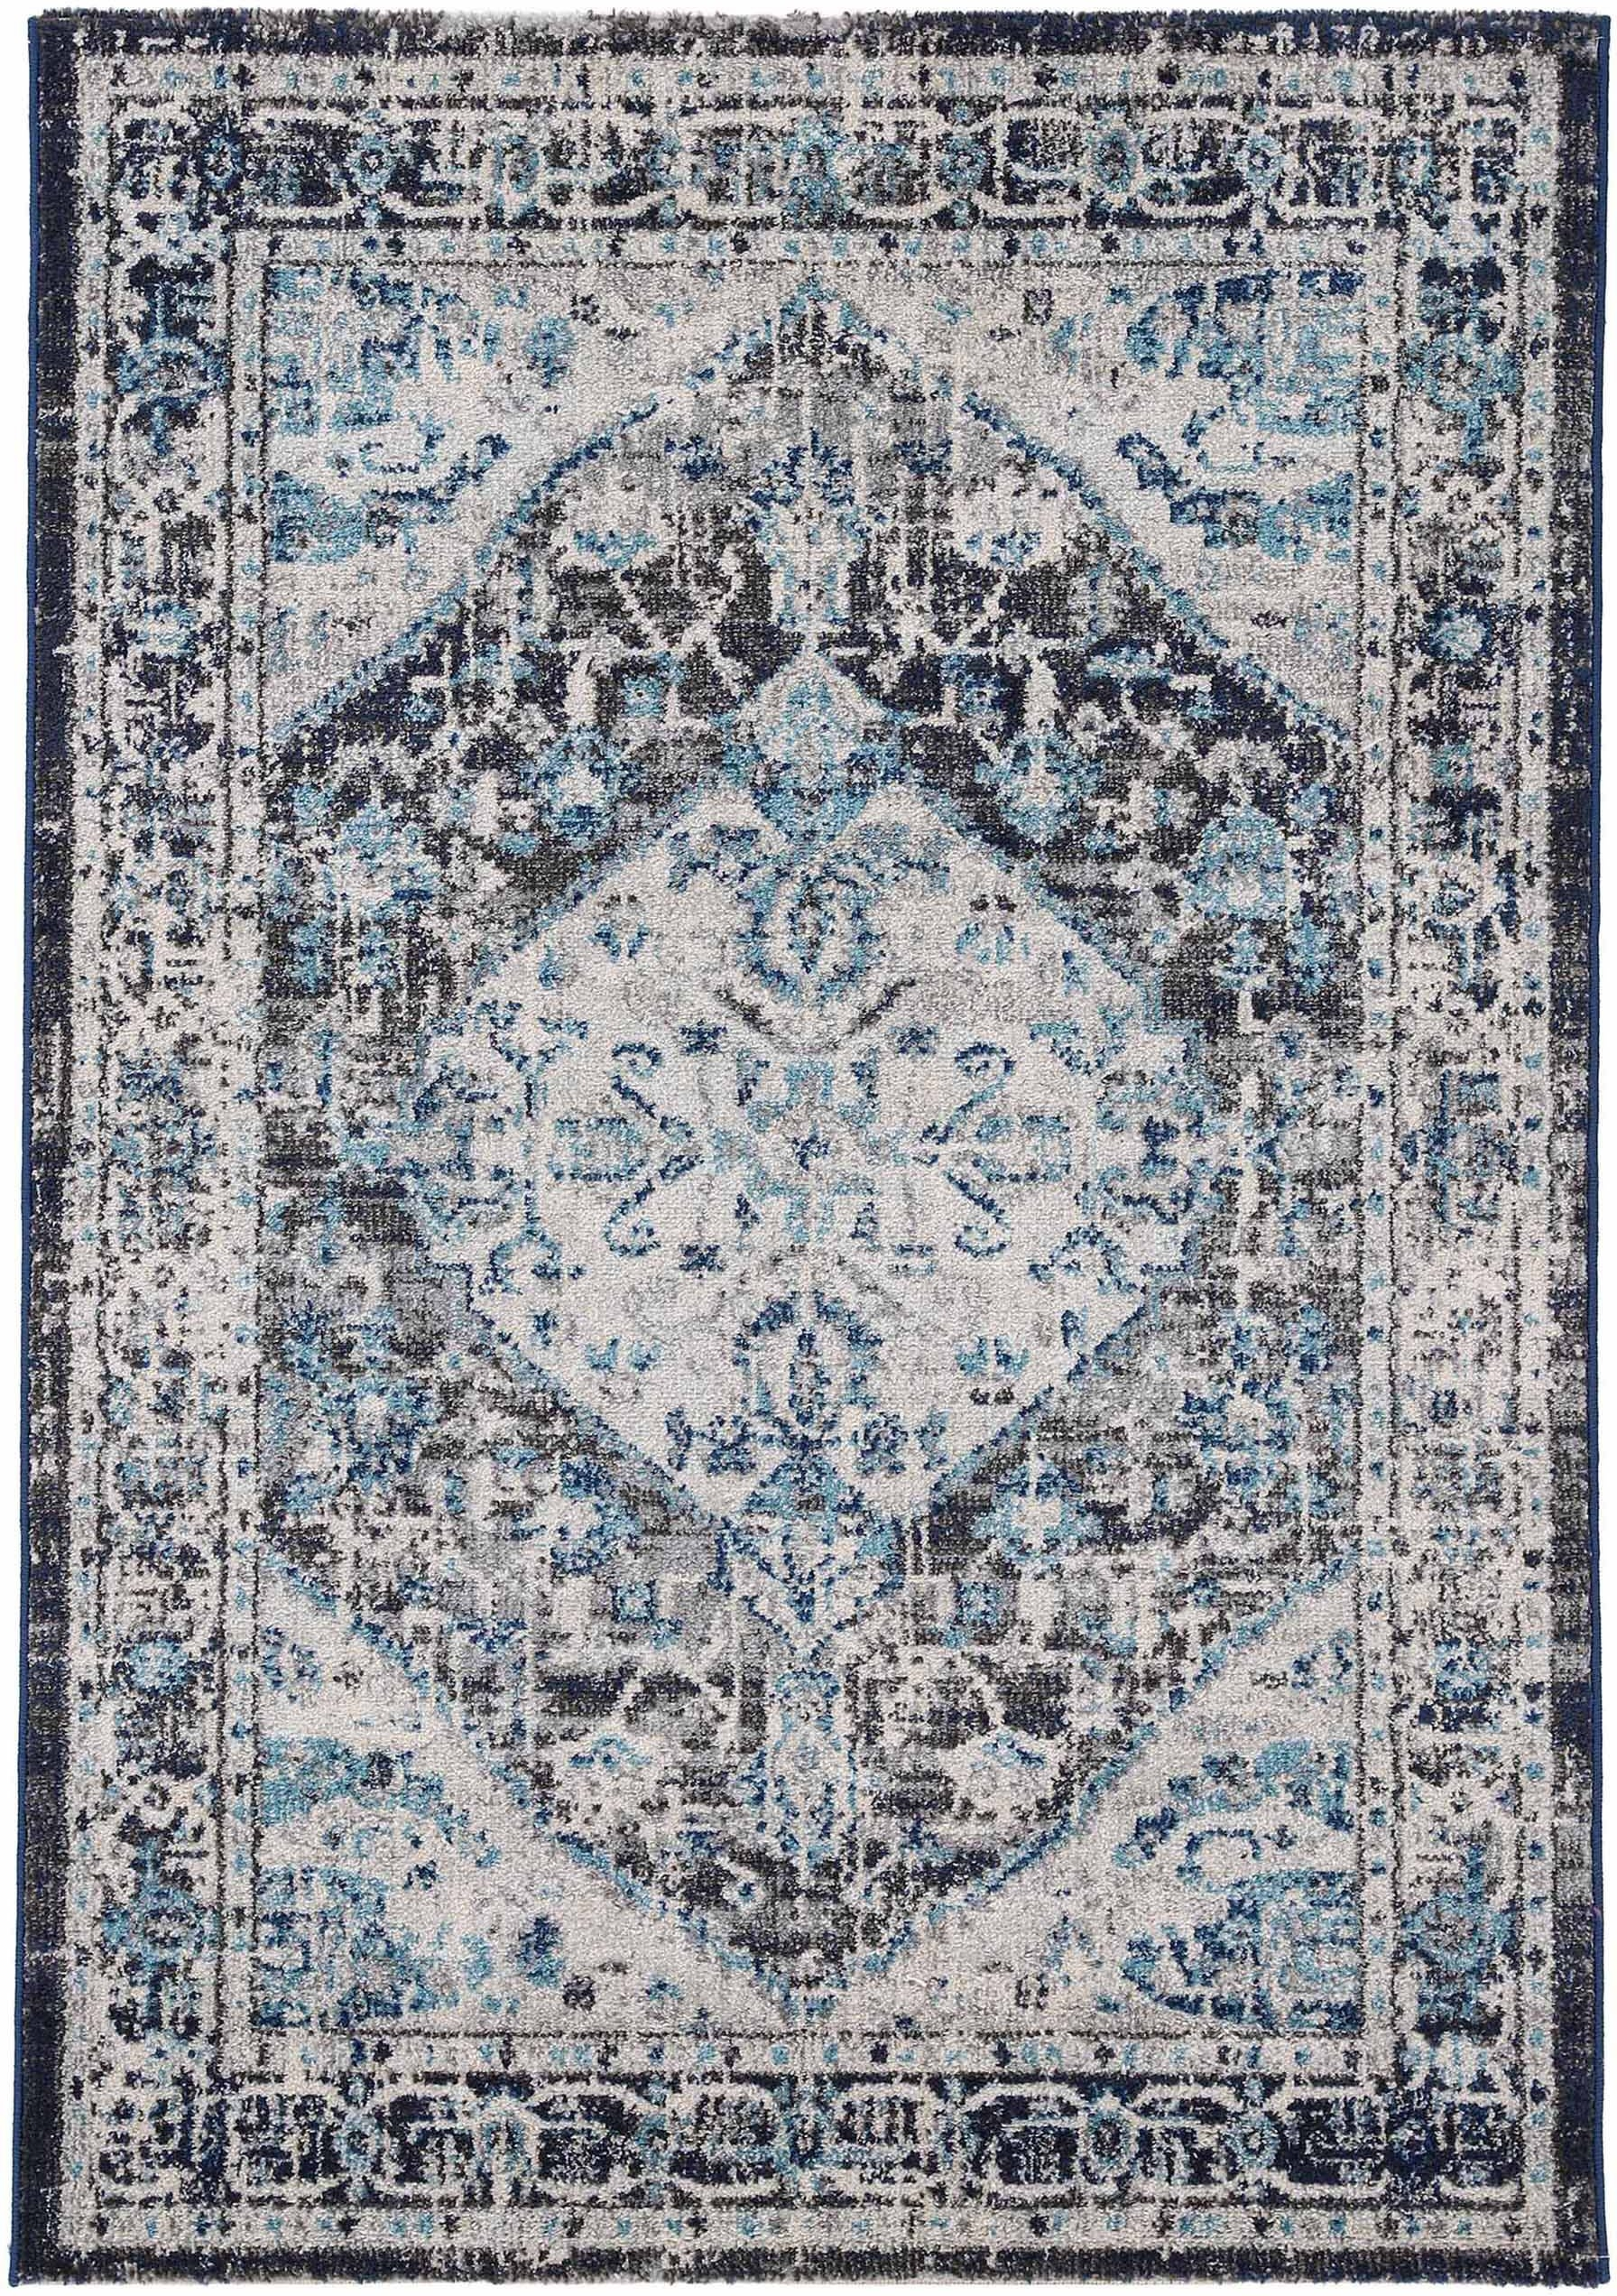 carpetfine vloerkleed Sadaf Vintage-look, woonkamer bestellen: 30 dagen bedenktijd